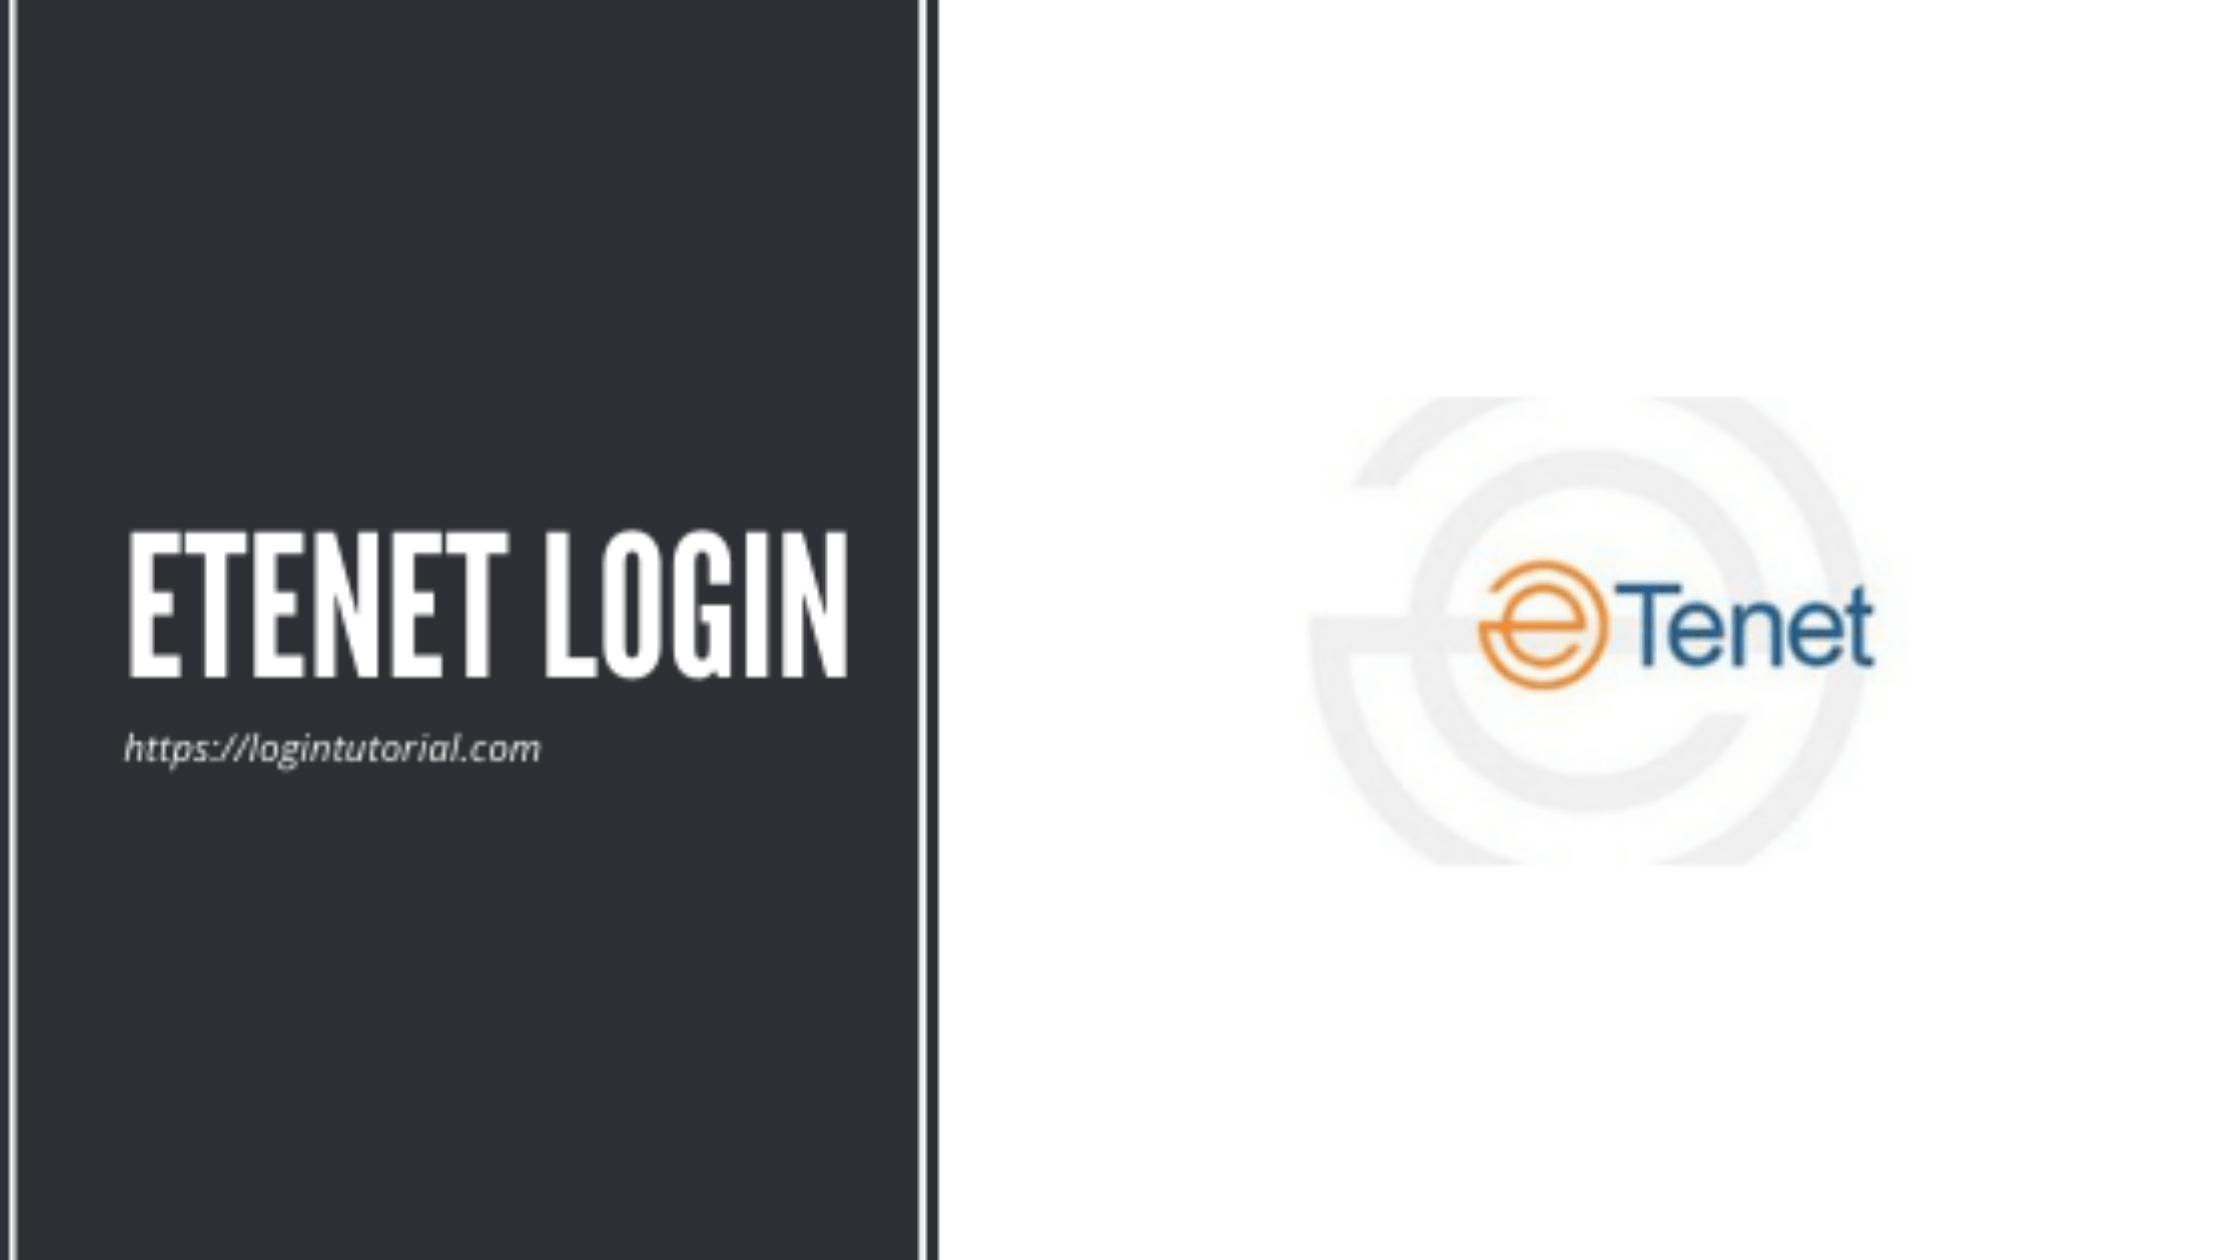 eTenet employee login With Benefits